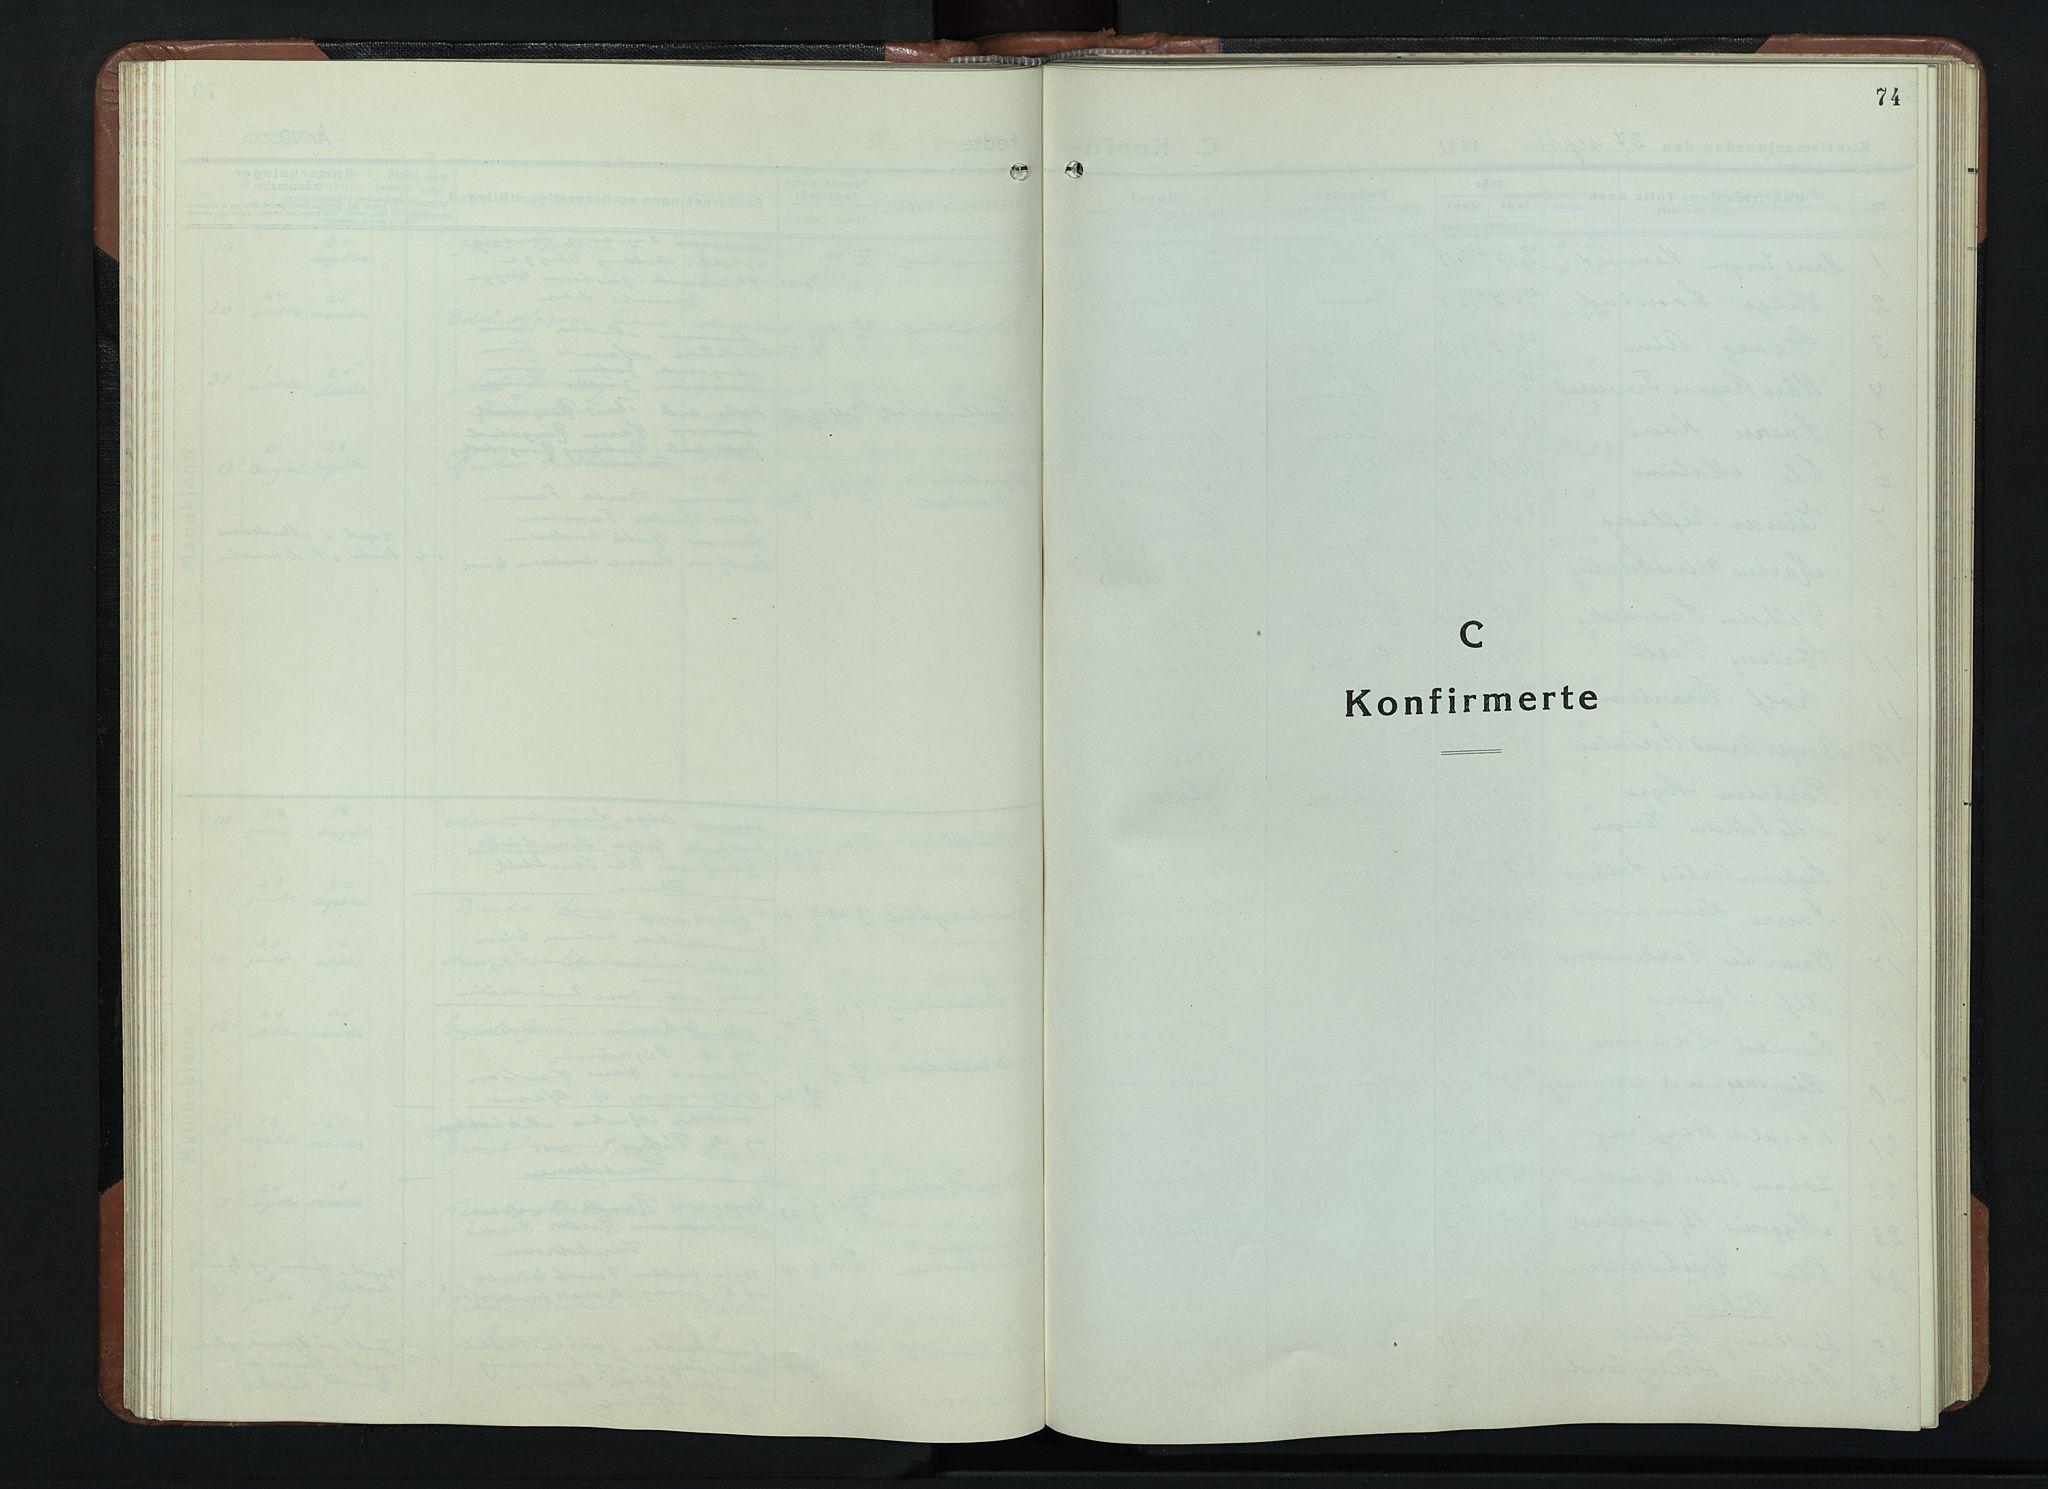 SAH, Vardal prestekontor, H/Ha/Hab/L0018: Klokkerbok nr. 18, 1931-1951, s. 74